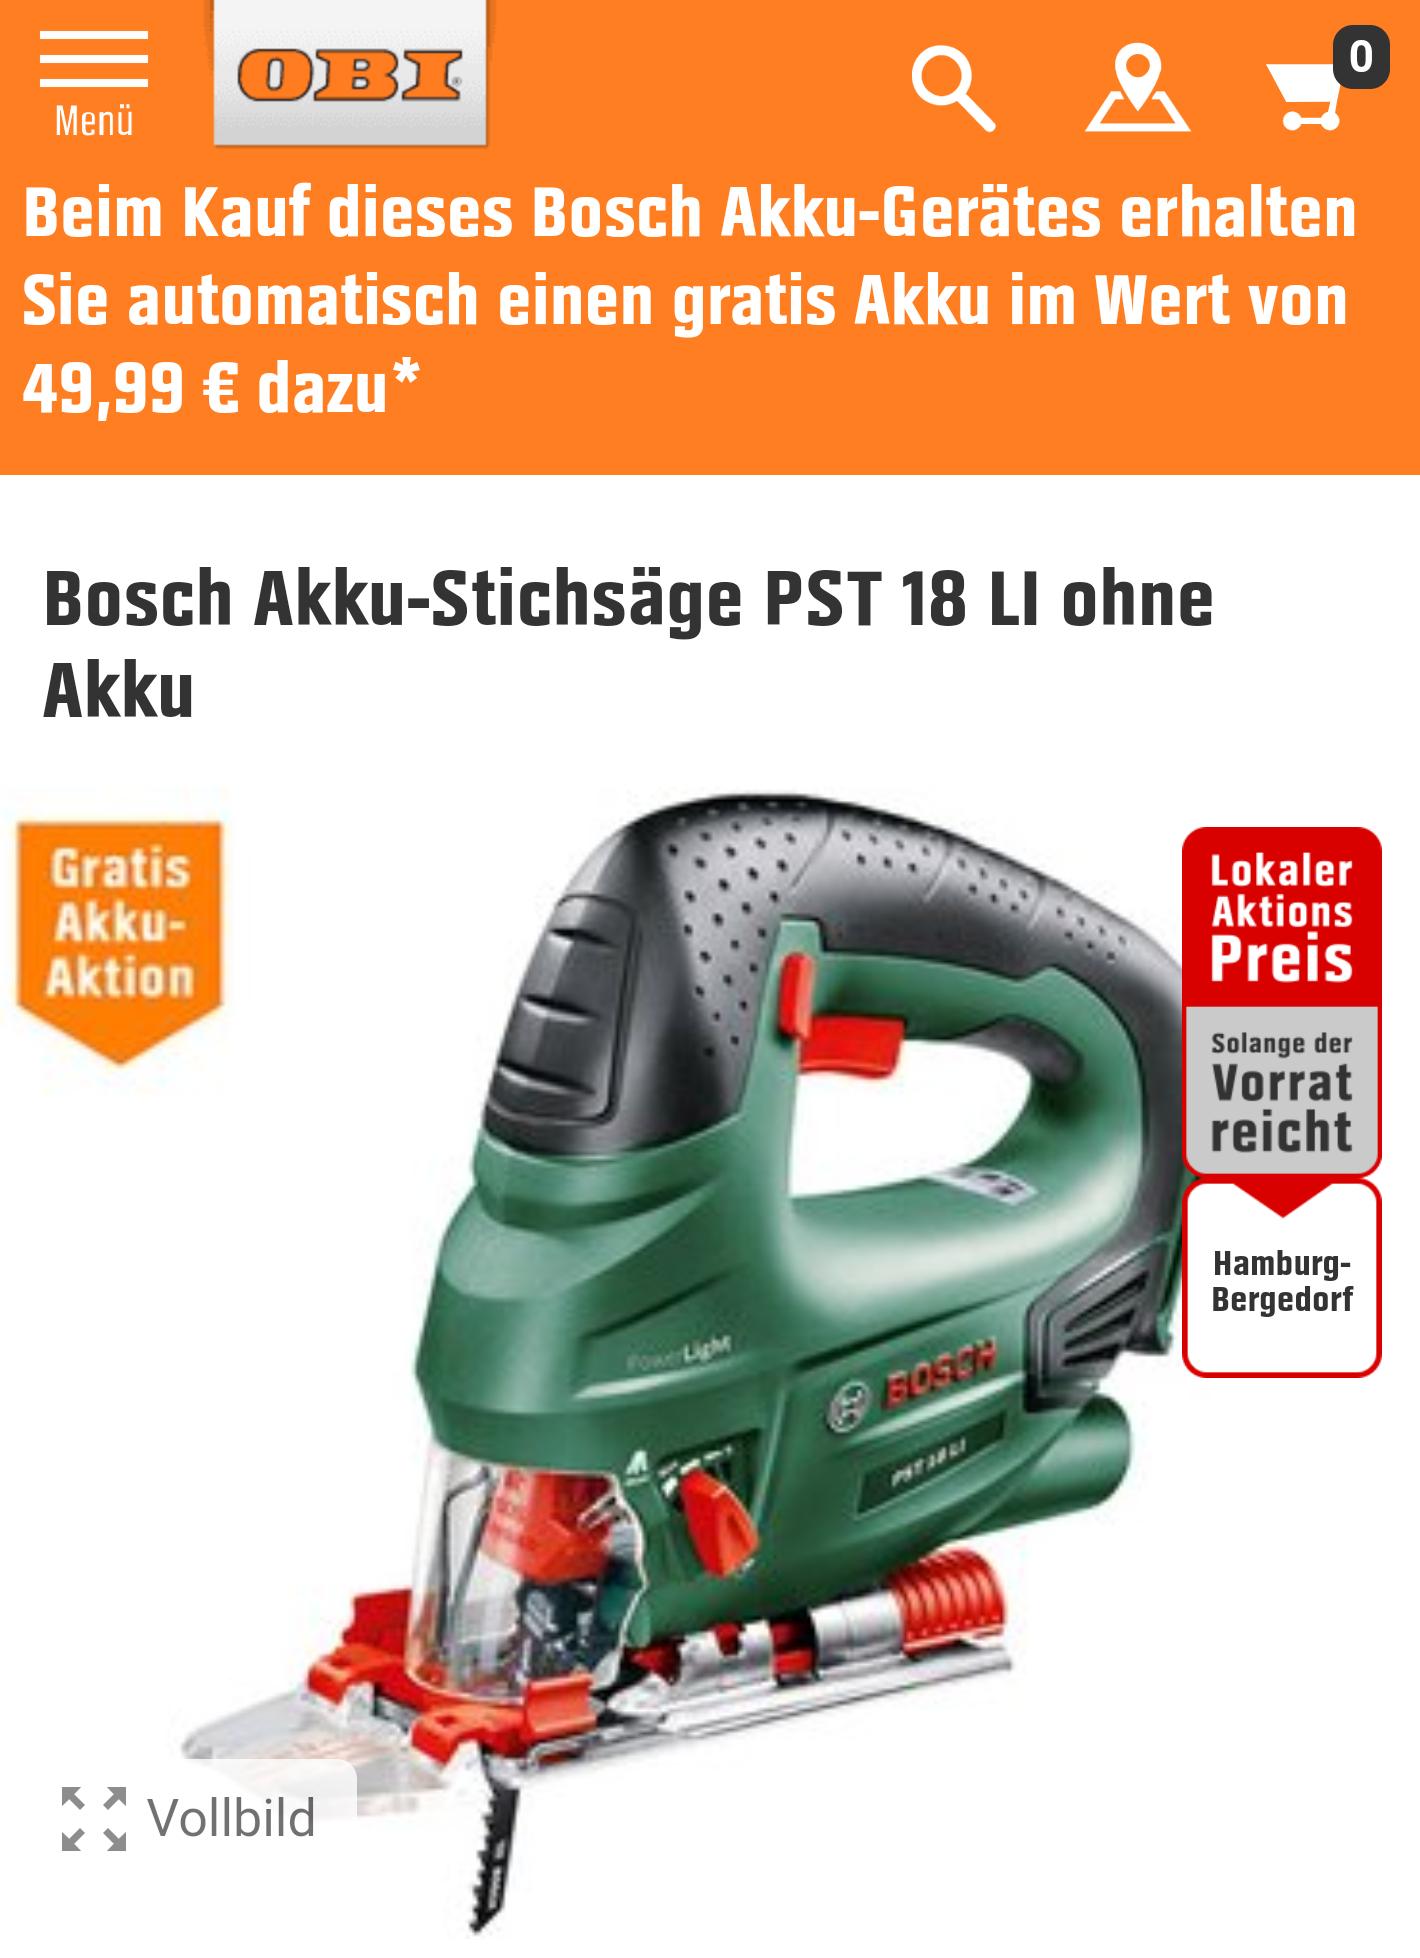 [Lokal Obi HH-Bergedorf] Bosch PST 18 Li inkl. Akku Starter Pack im Wert von 49,99 Euro